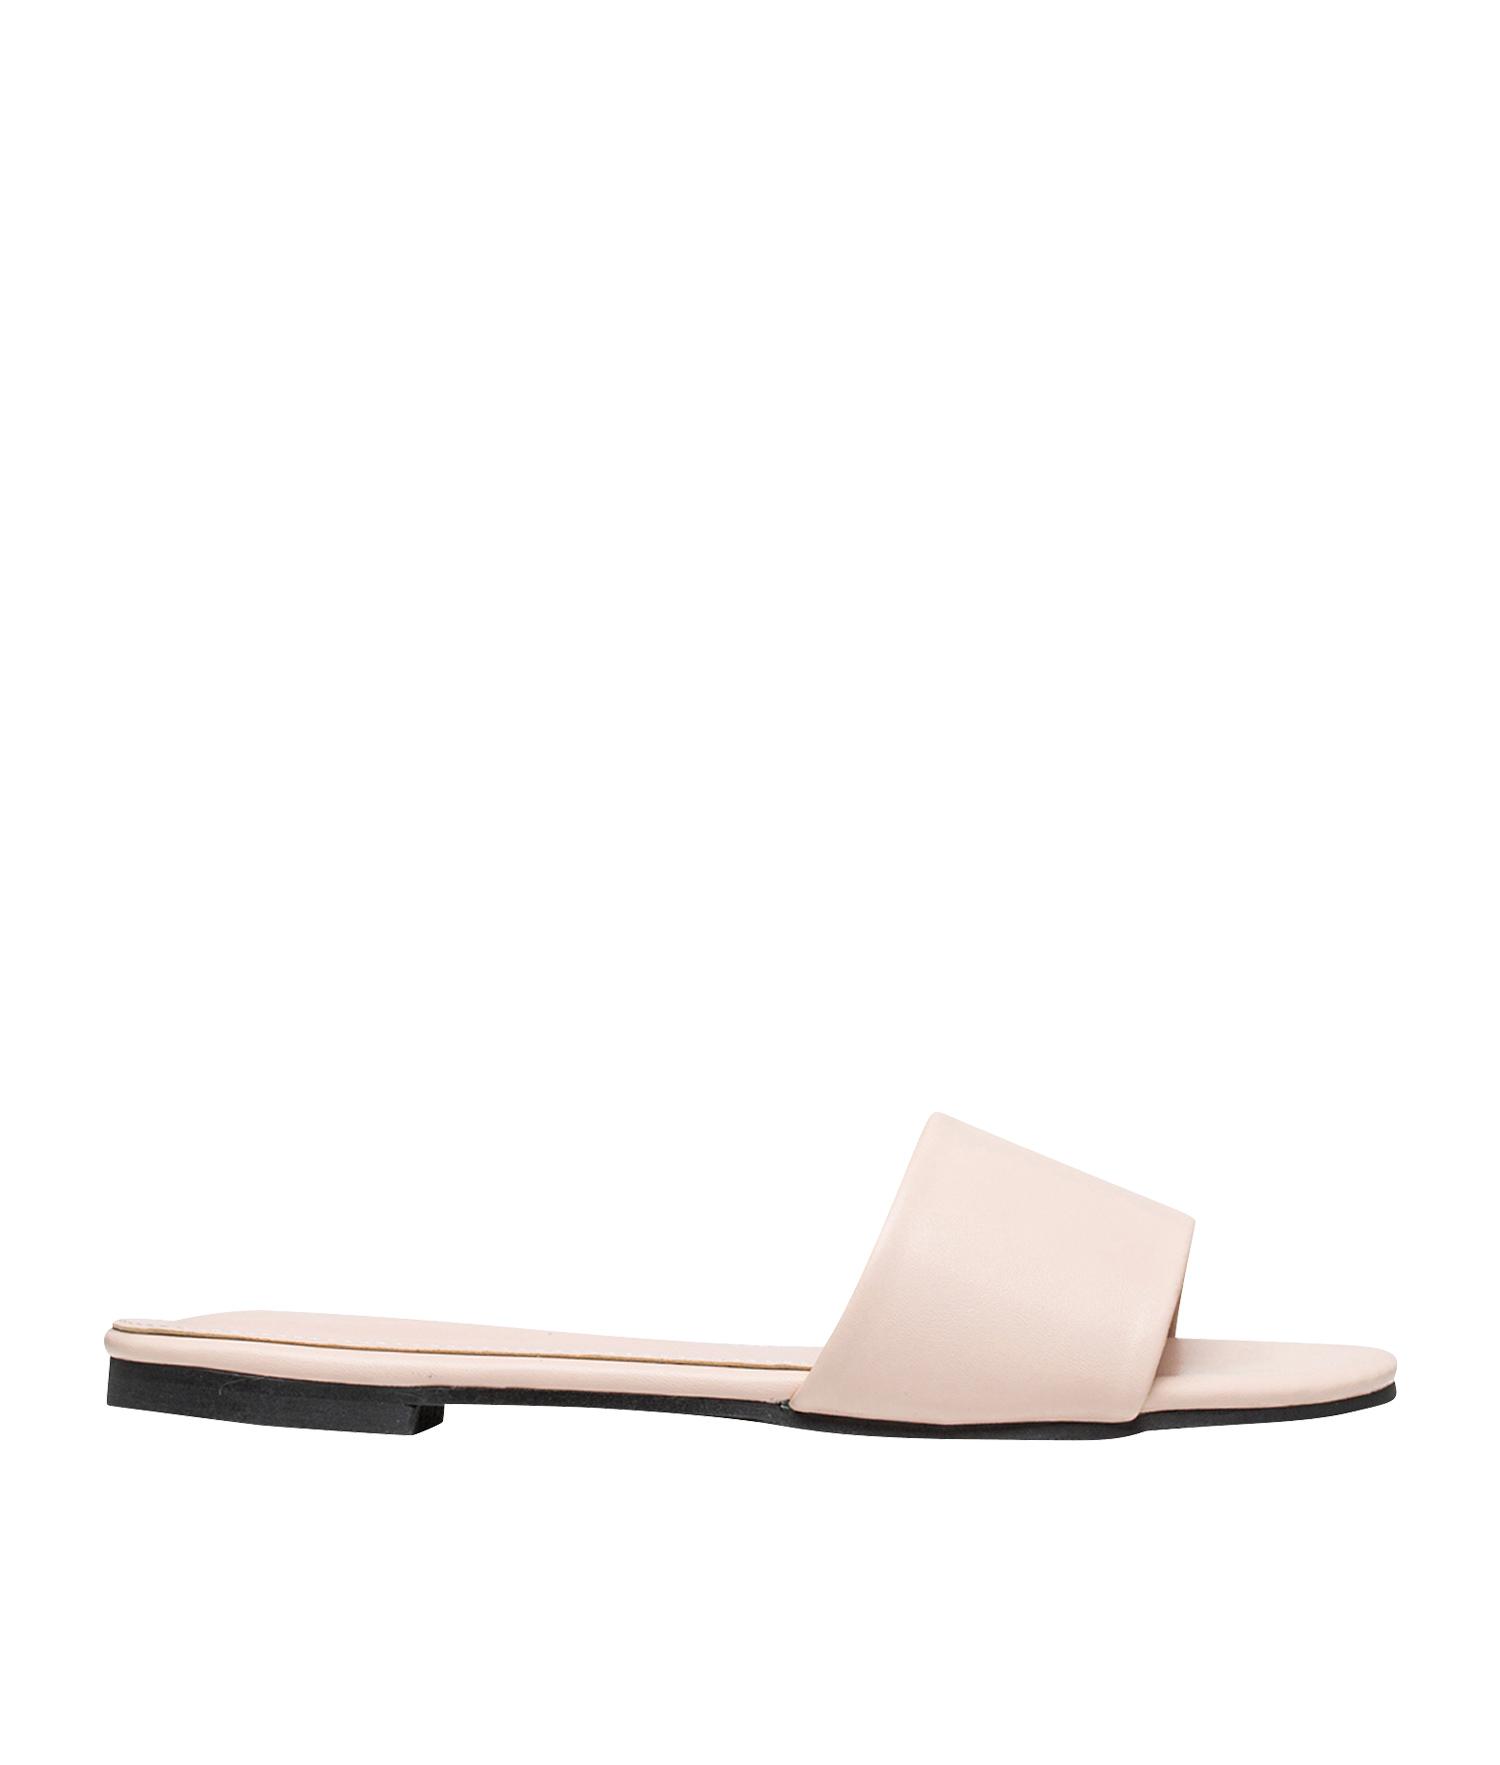 9ee82b8838d AnnaKastle Womens Vegan Leather One Strap Slide Sandals Pink